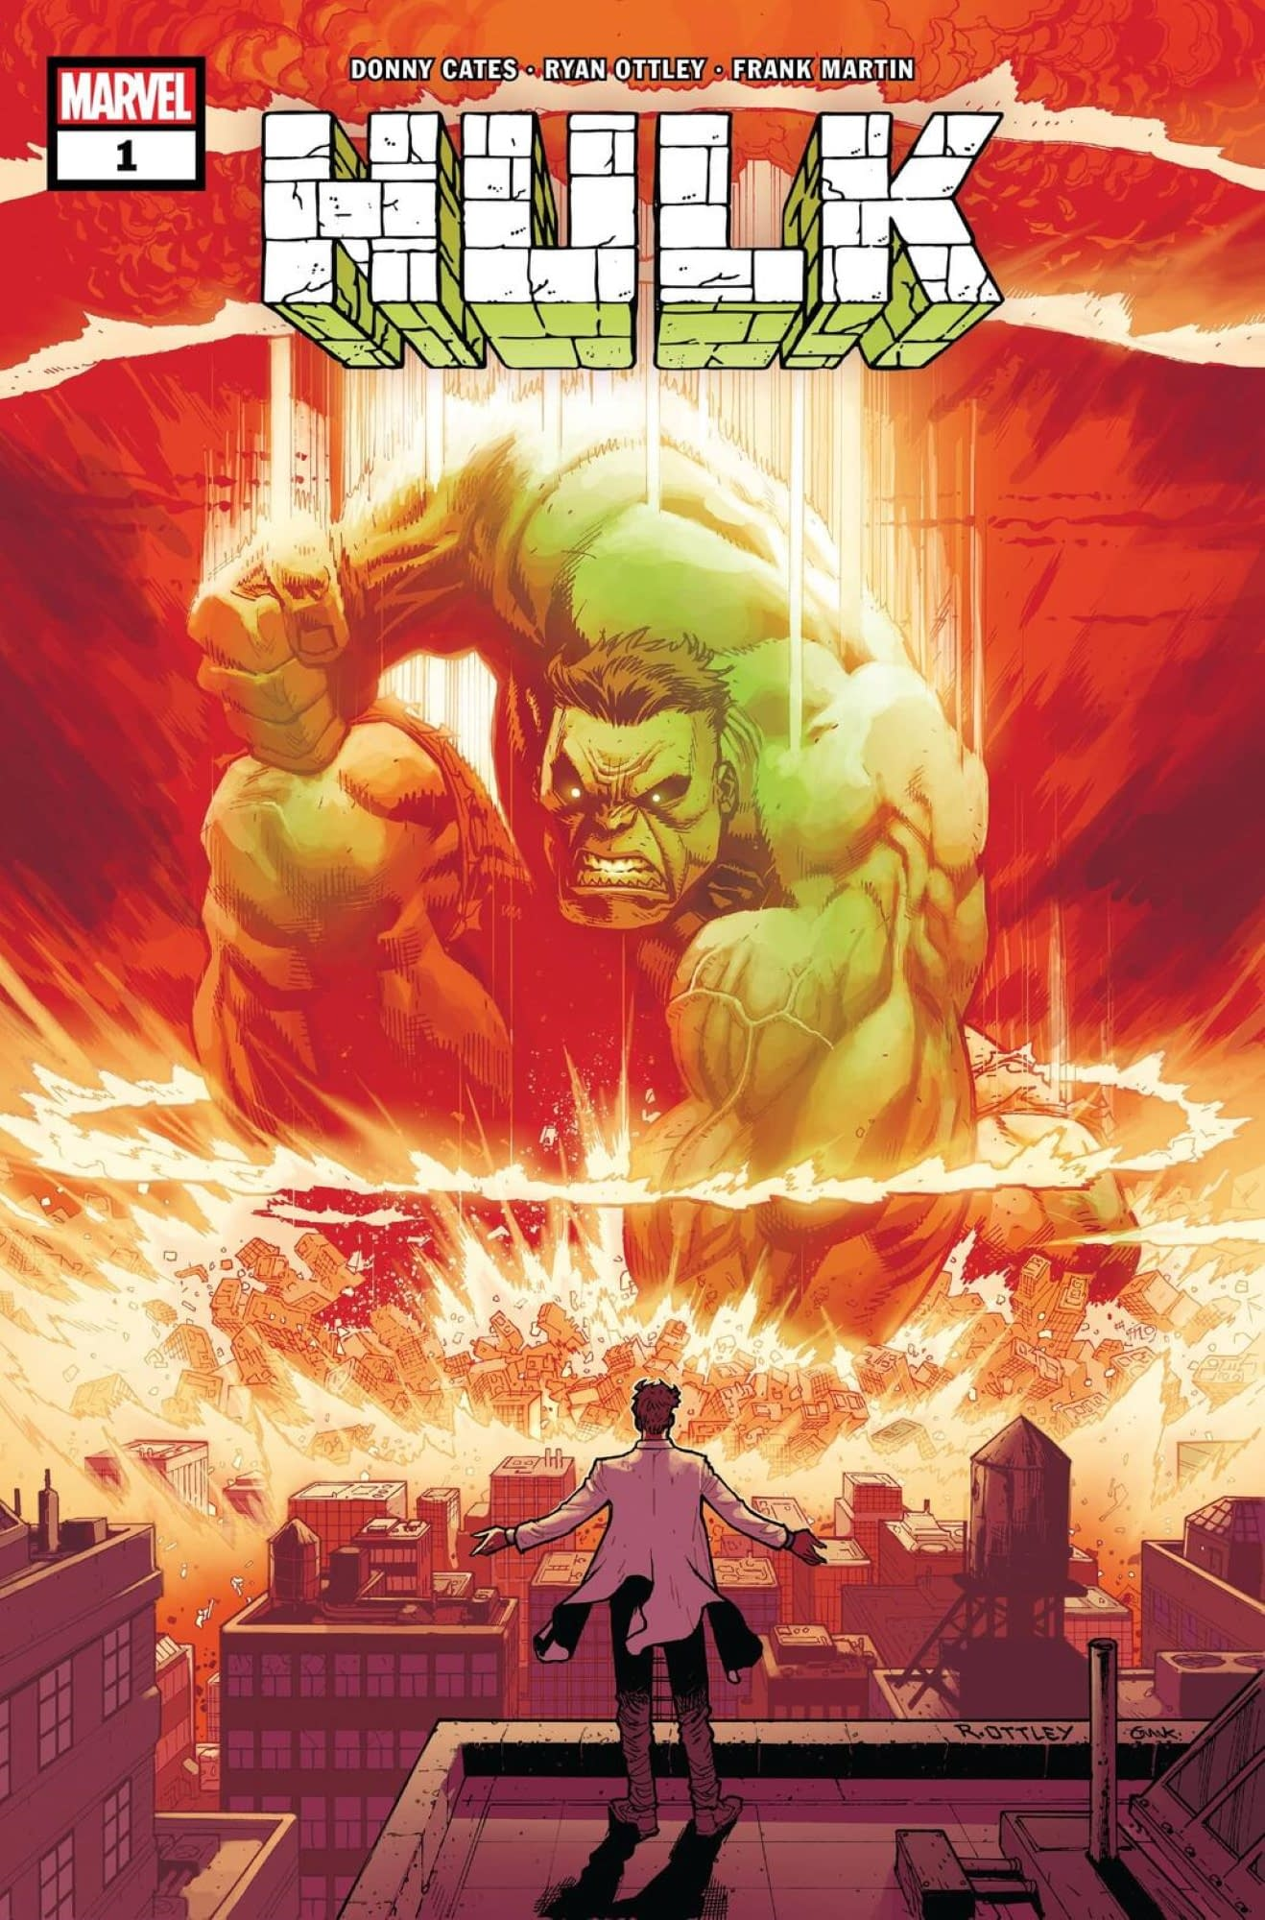 Donny Cates and Ryan Ottley Take Over Hulk Comic in November